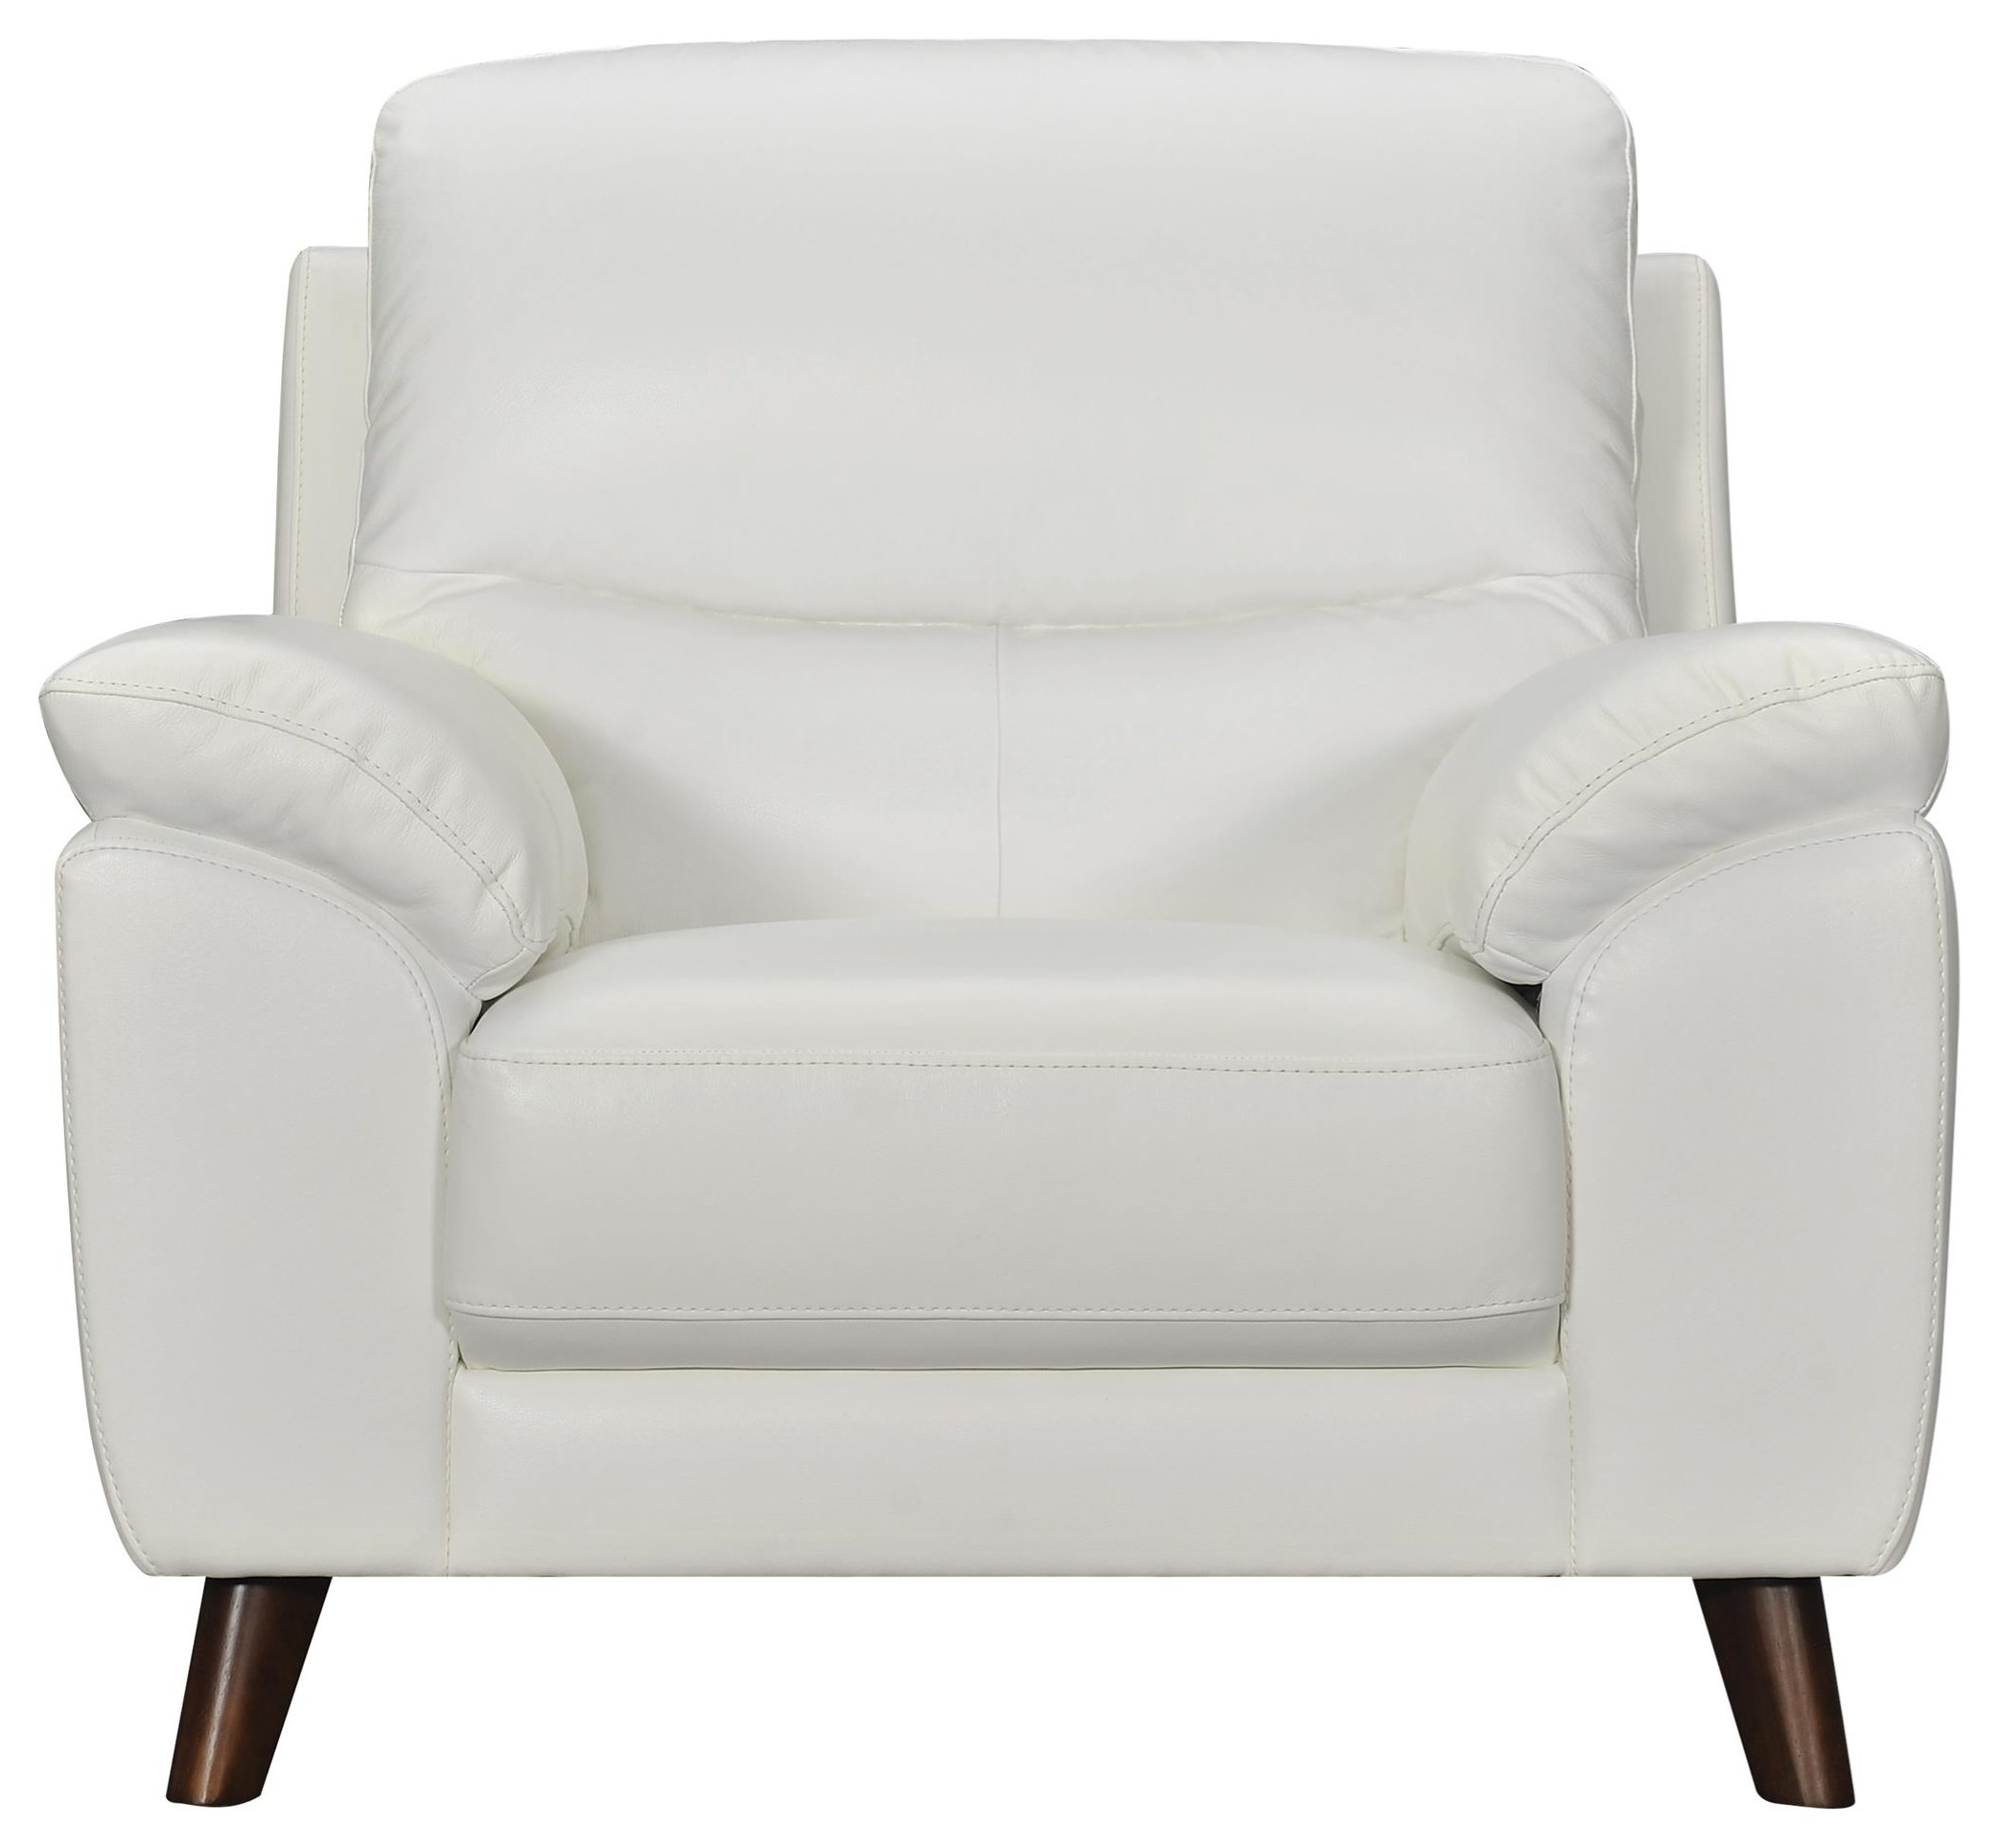 Frankie Chair by Violino at HomeWorld Furniture